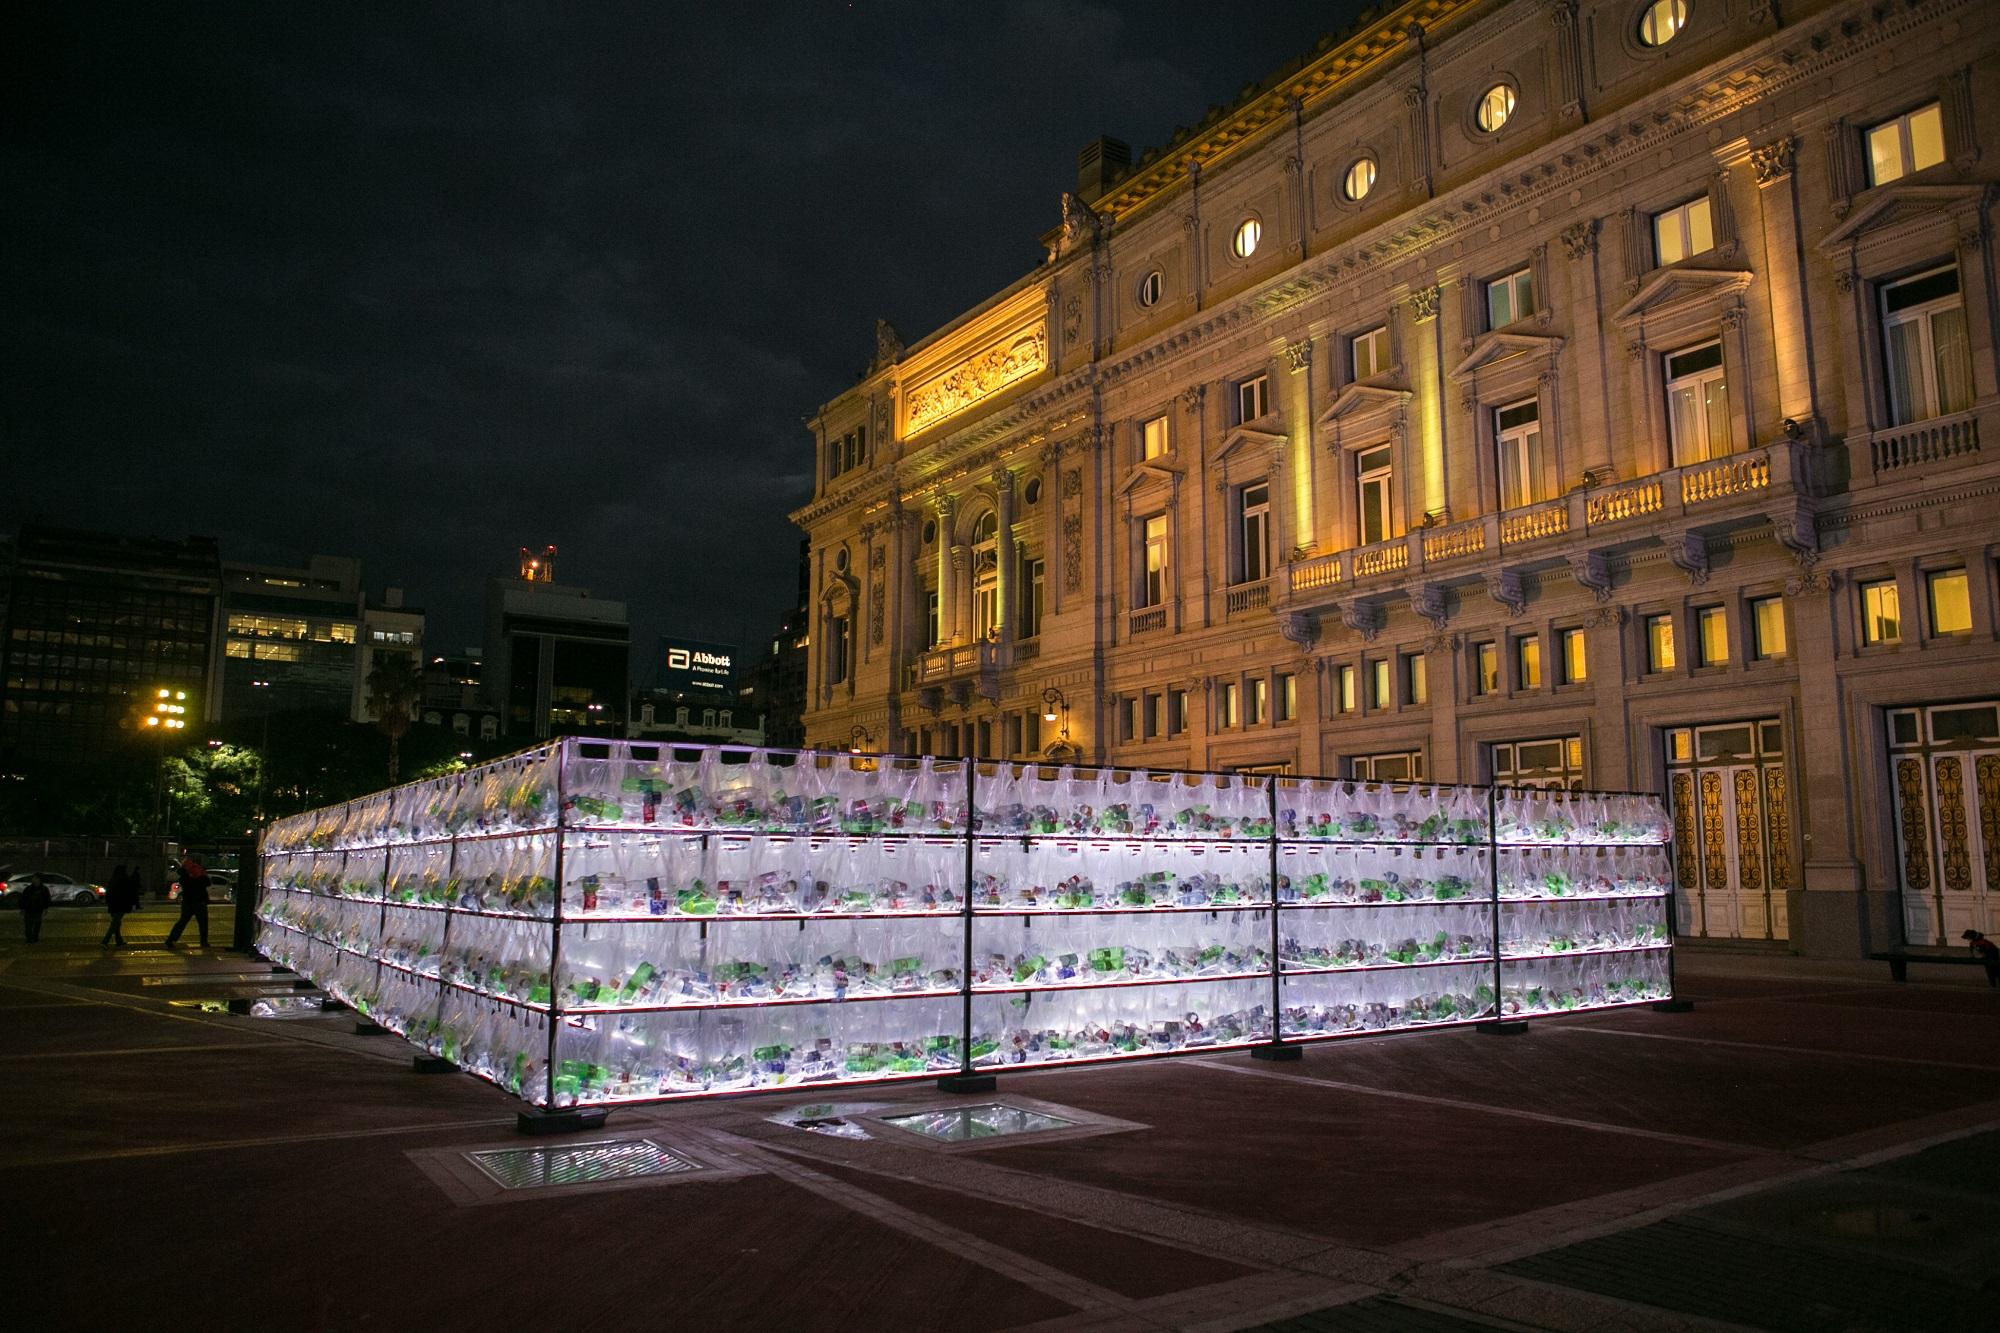 Luzinterruptus Plastic Waste Labyrinth Buenos Aires